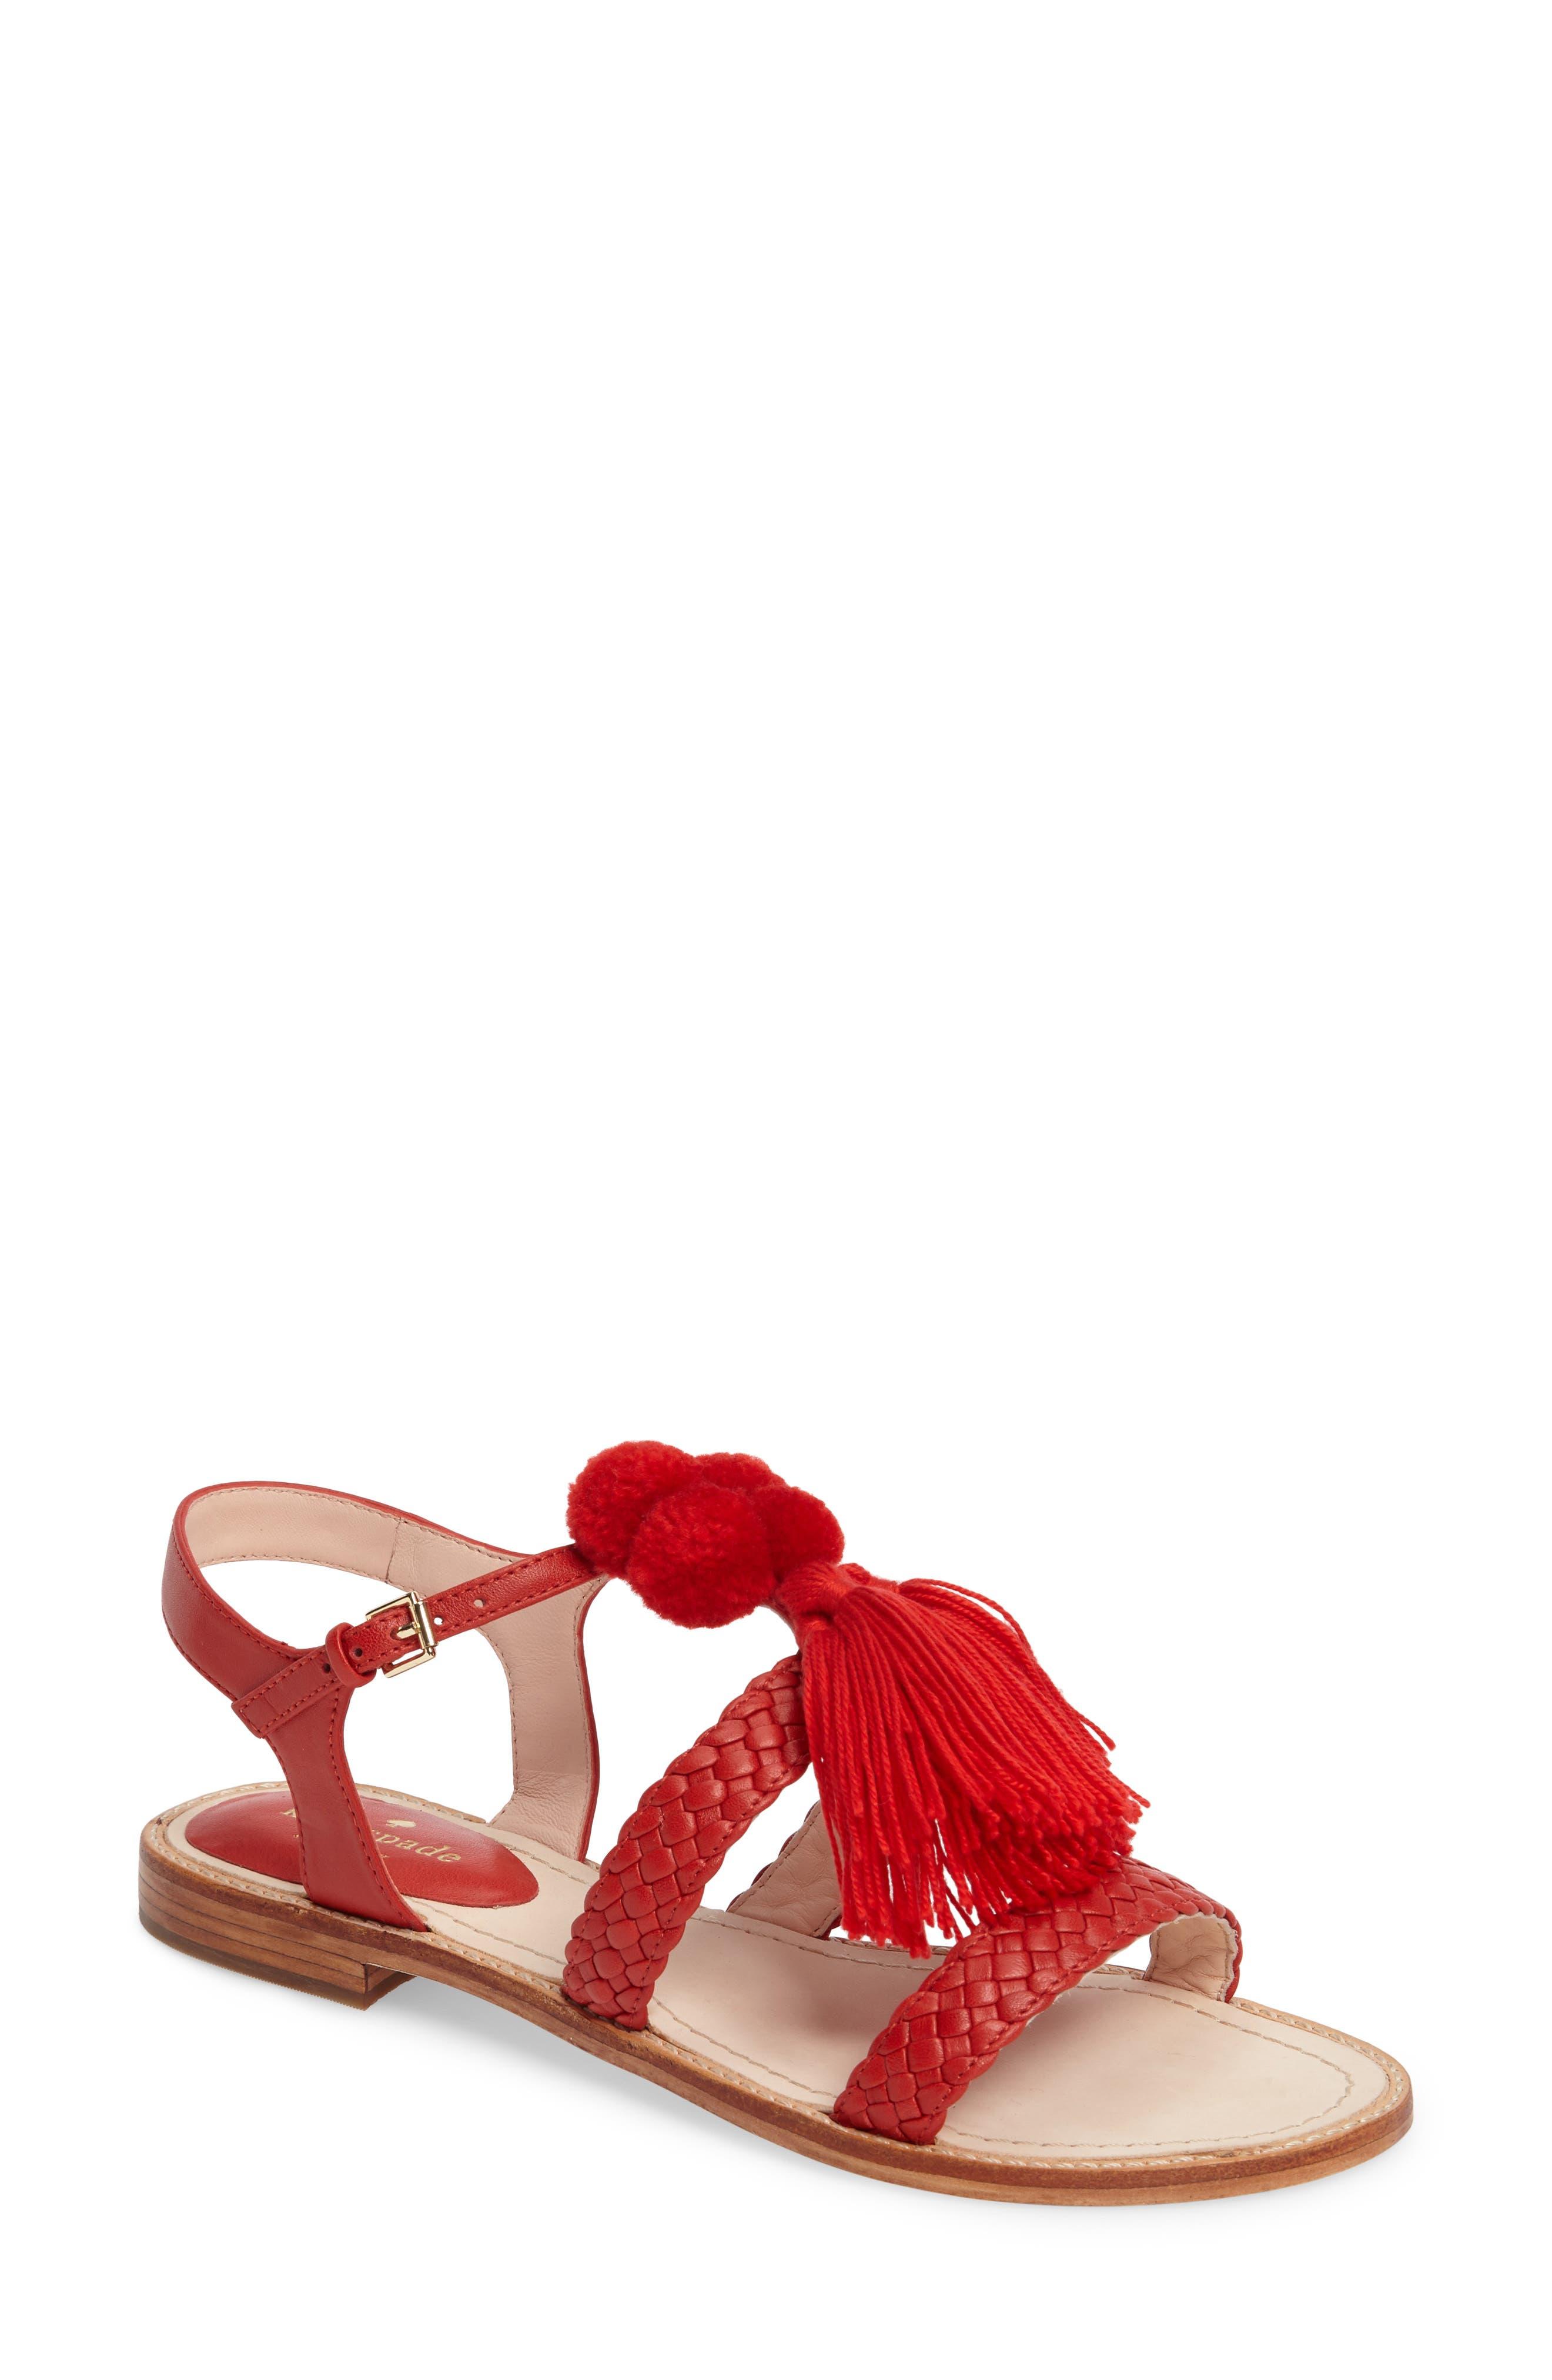 KATE SPADE NEW YORK sunset flat sandal